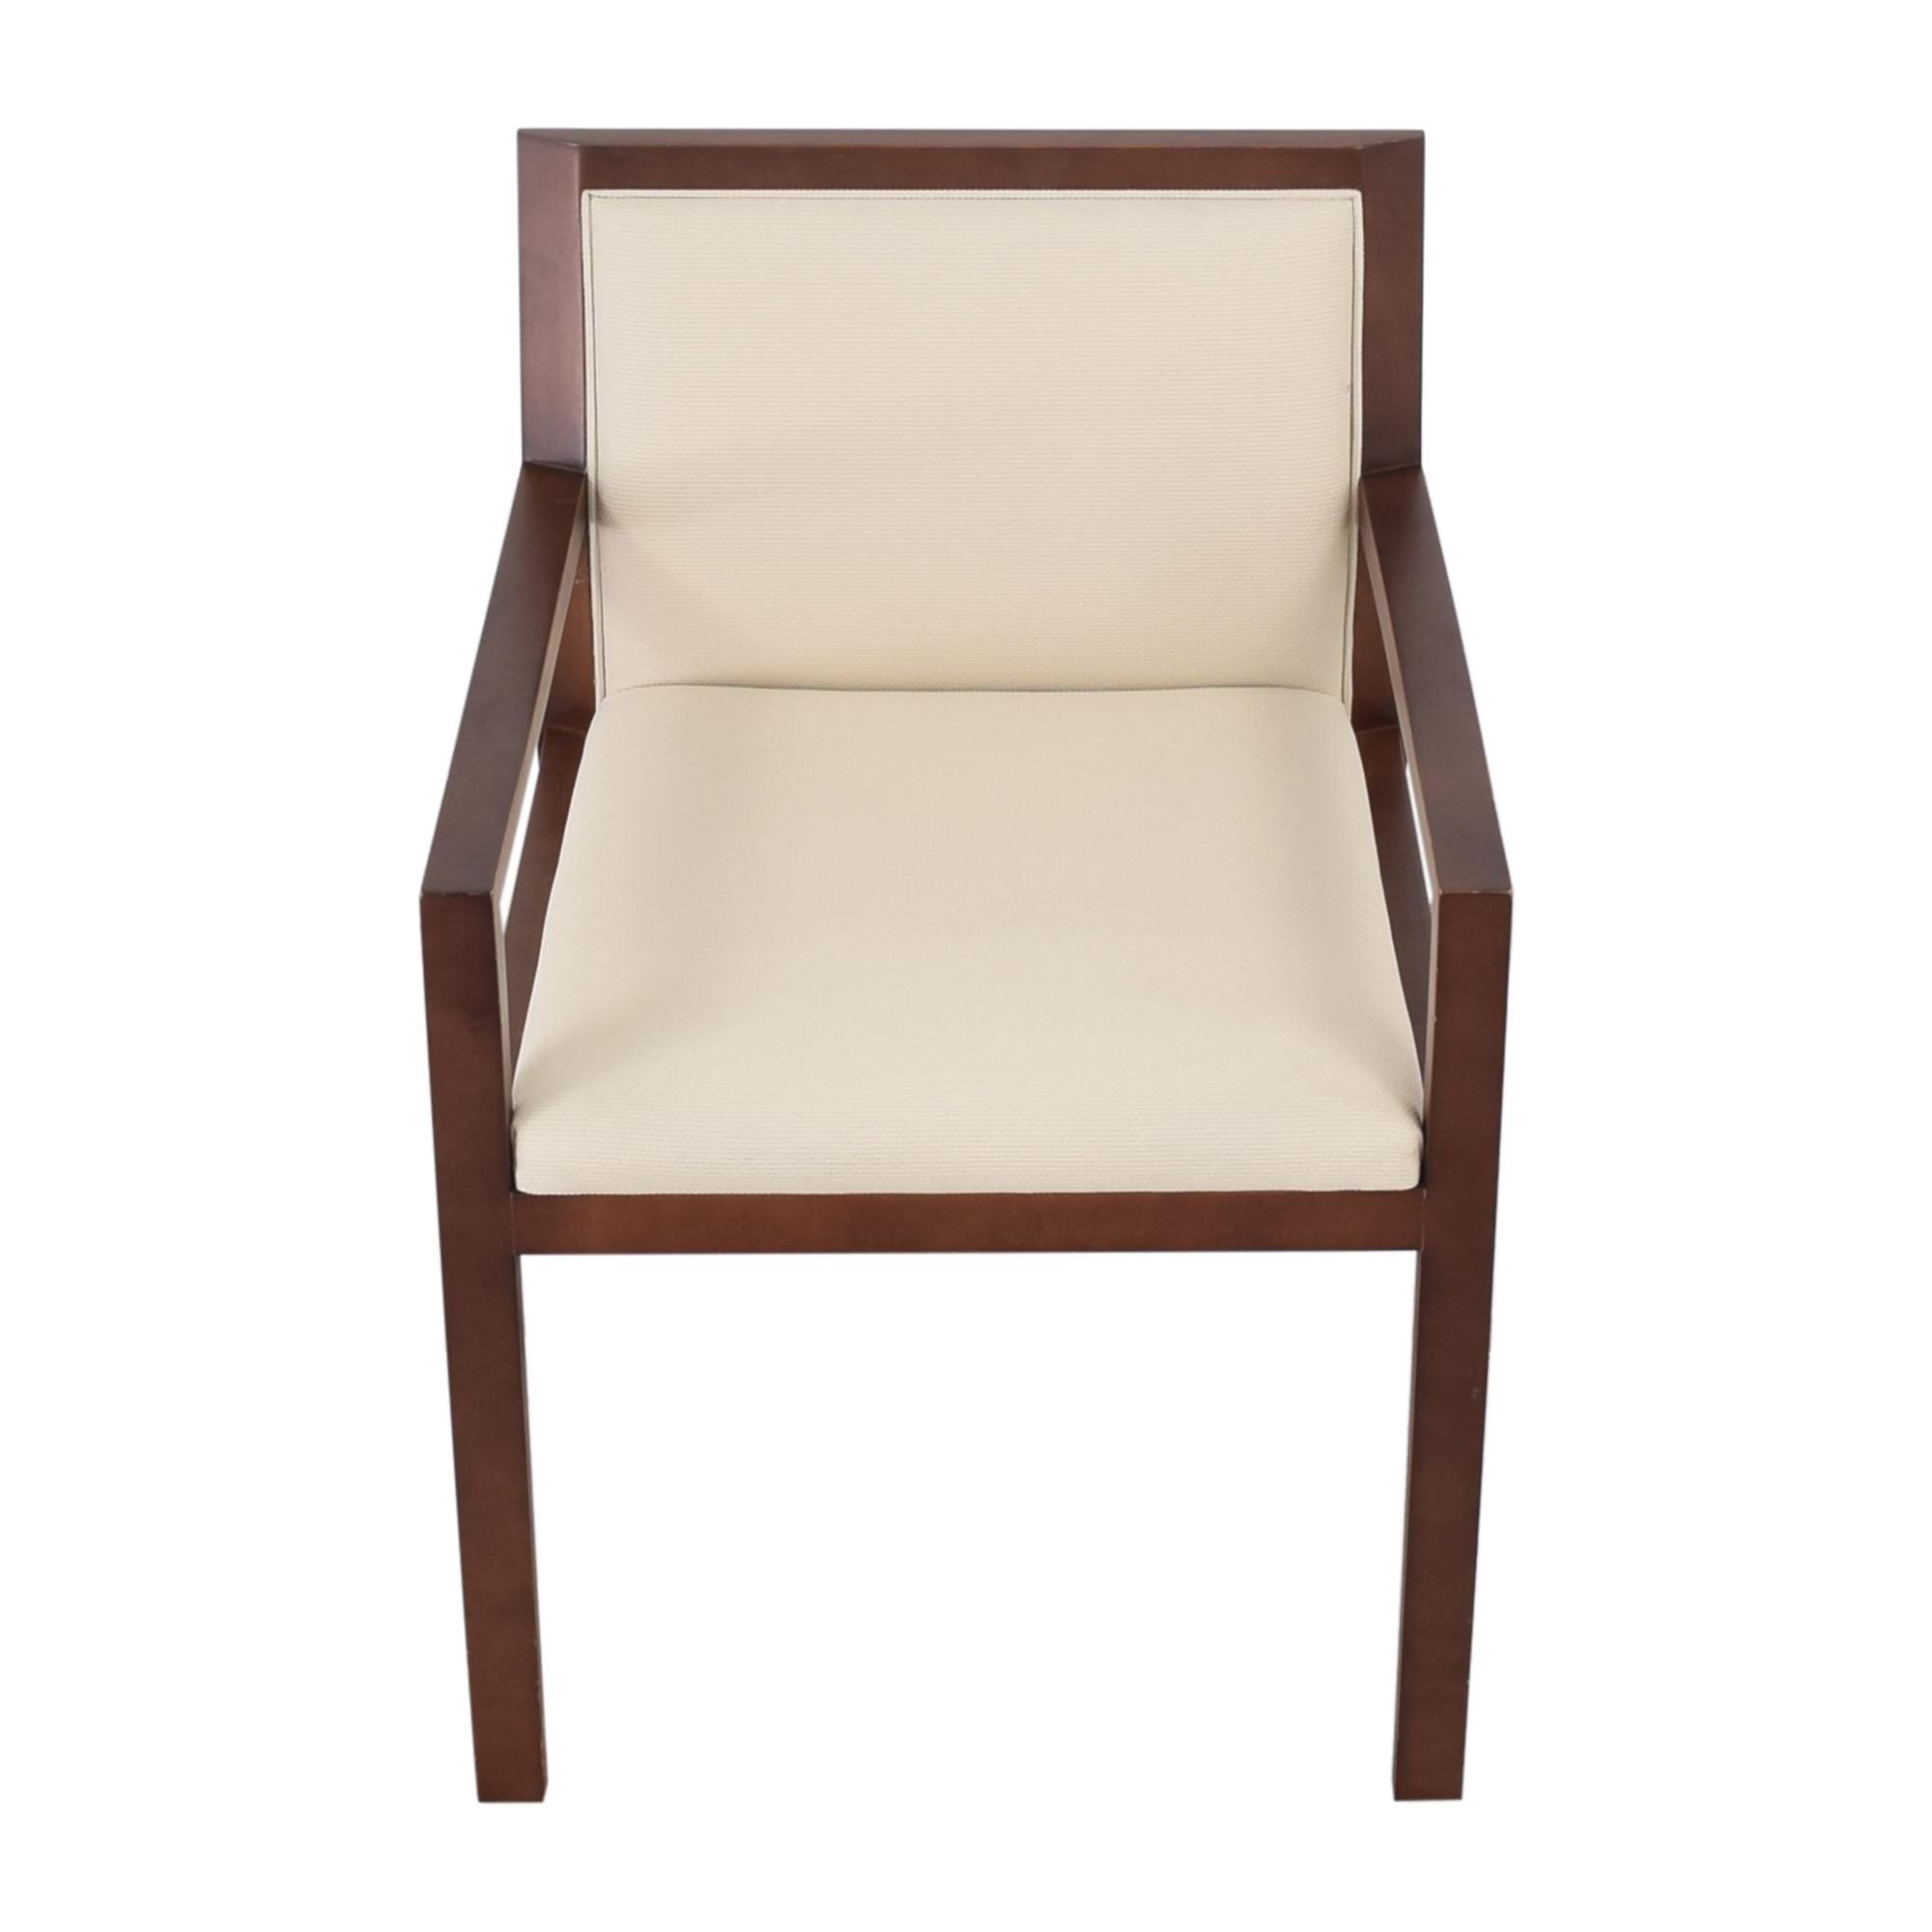 Bernhardt Bernhardt Fabric Desk Chair for sale